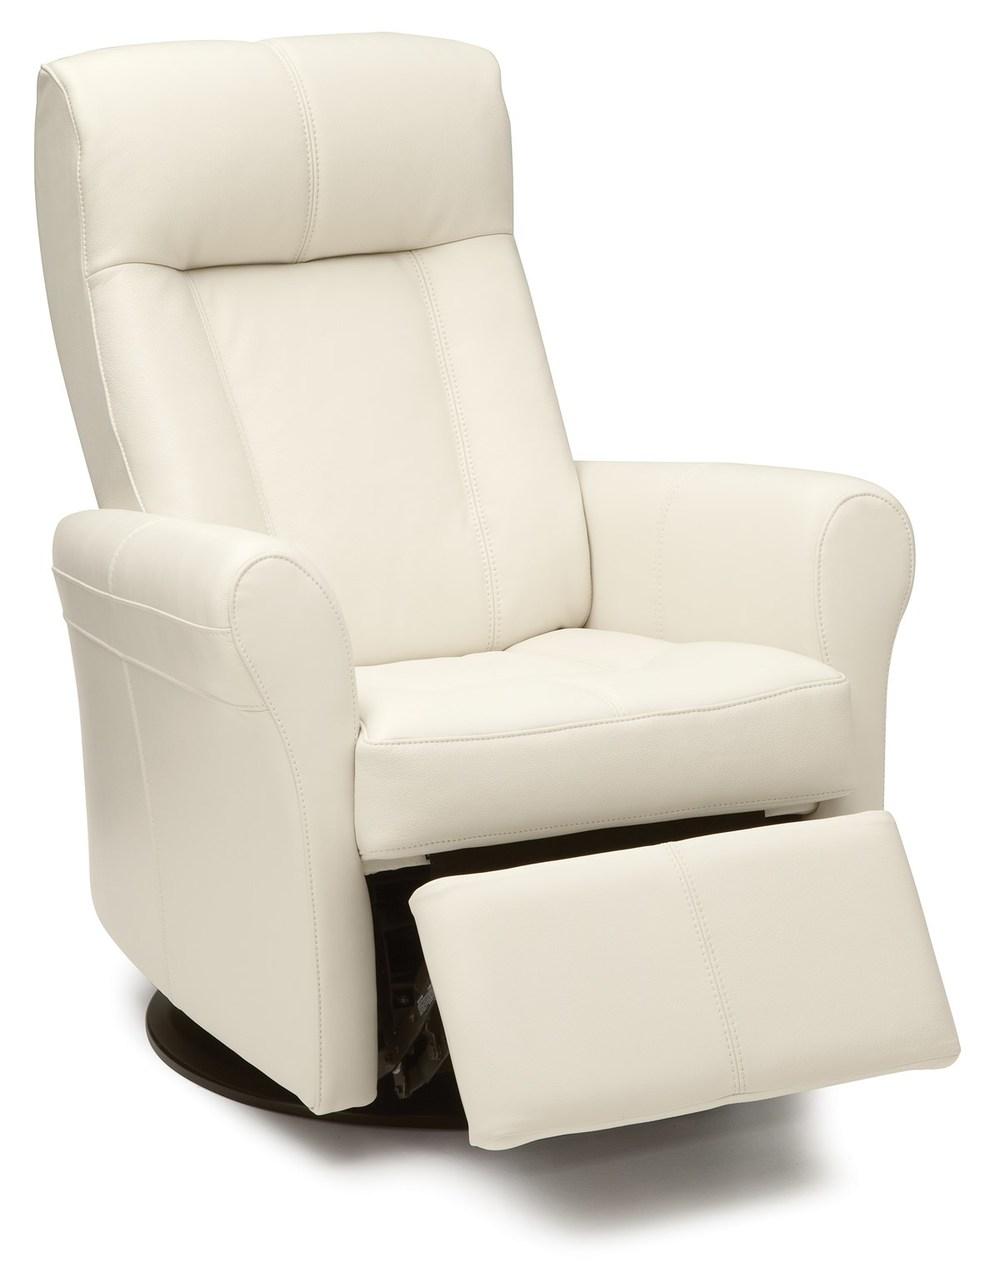 Palliser Furniture - Yellowstone Swivel Glider Recliner